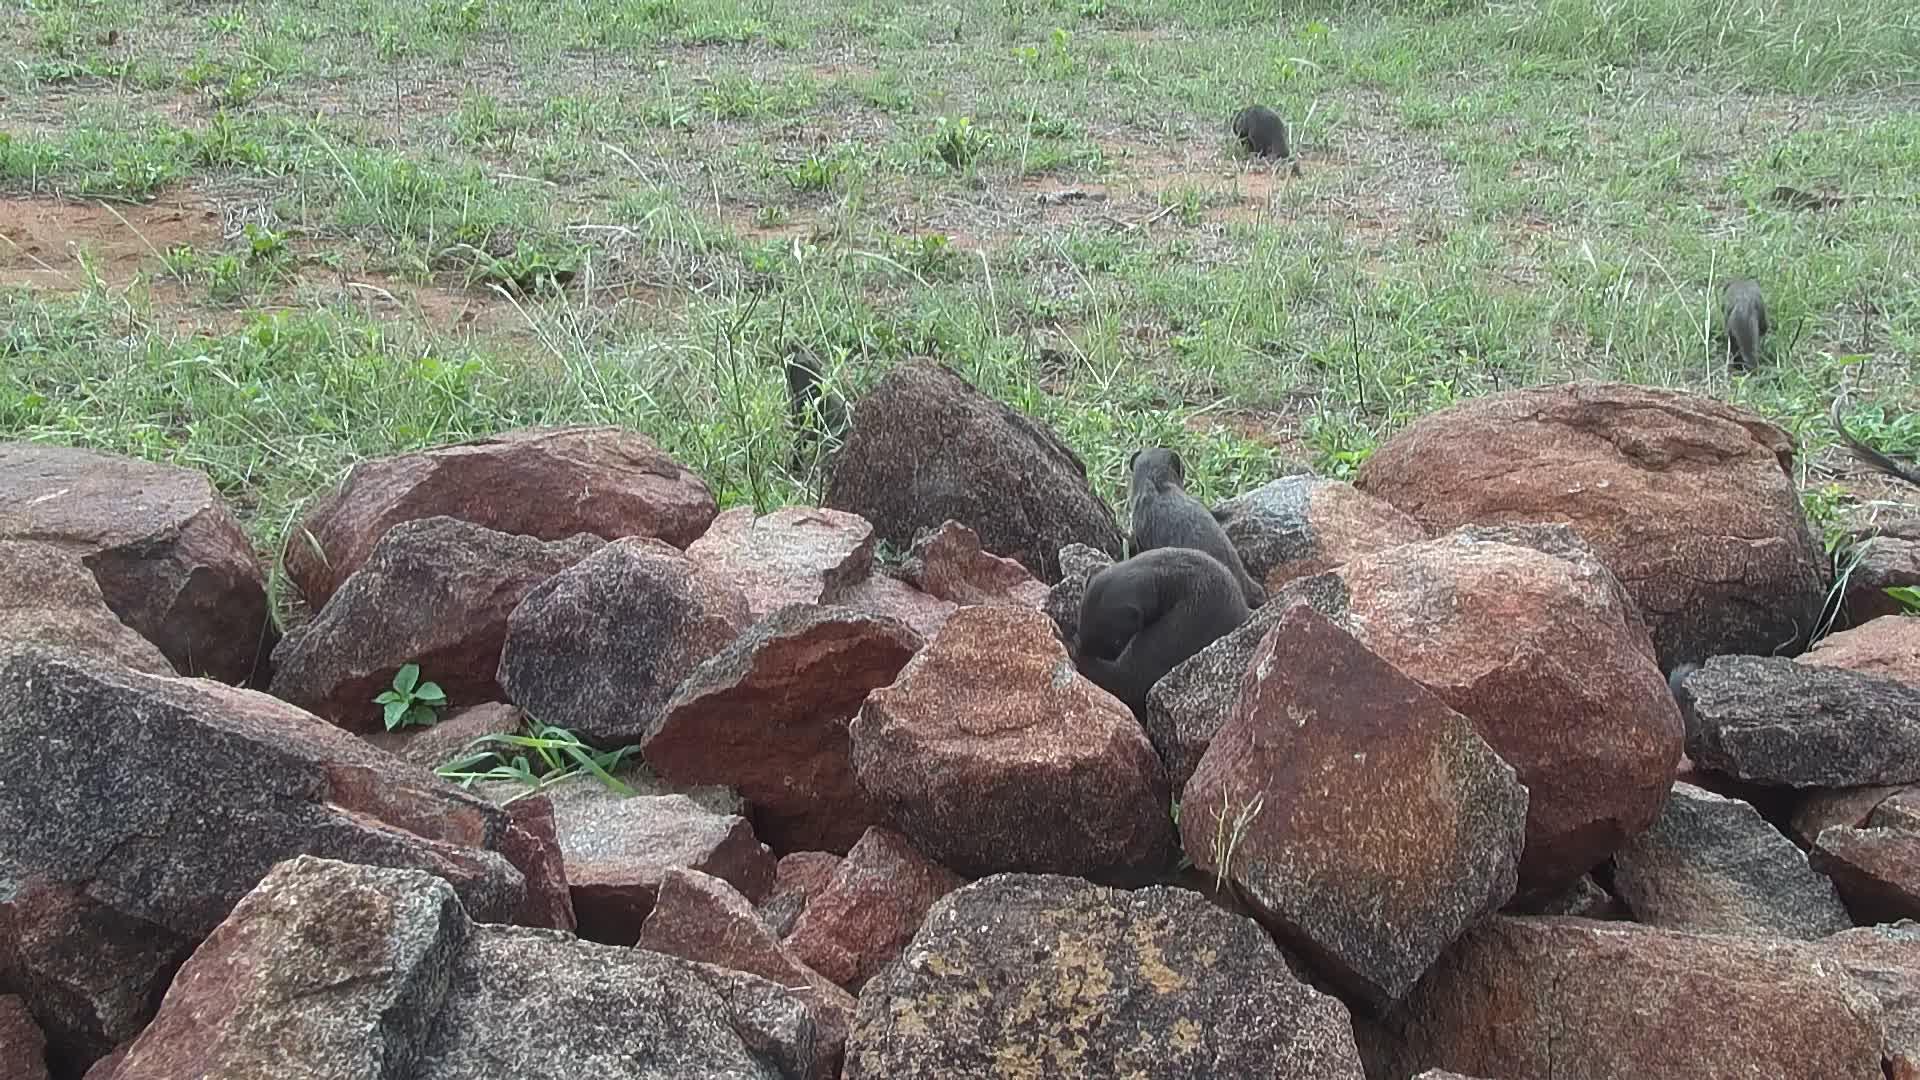 VIDEO: Dwarf Mongooses